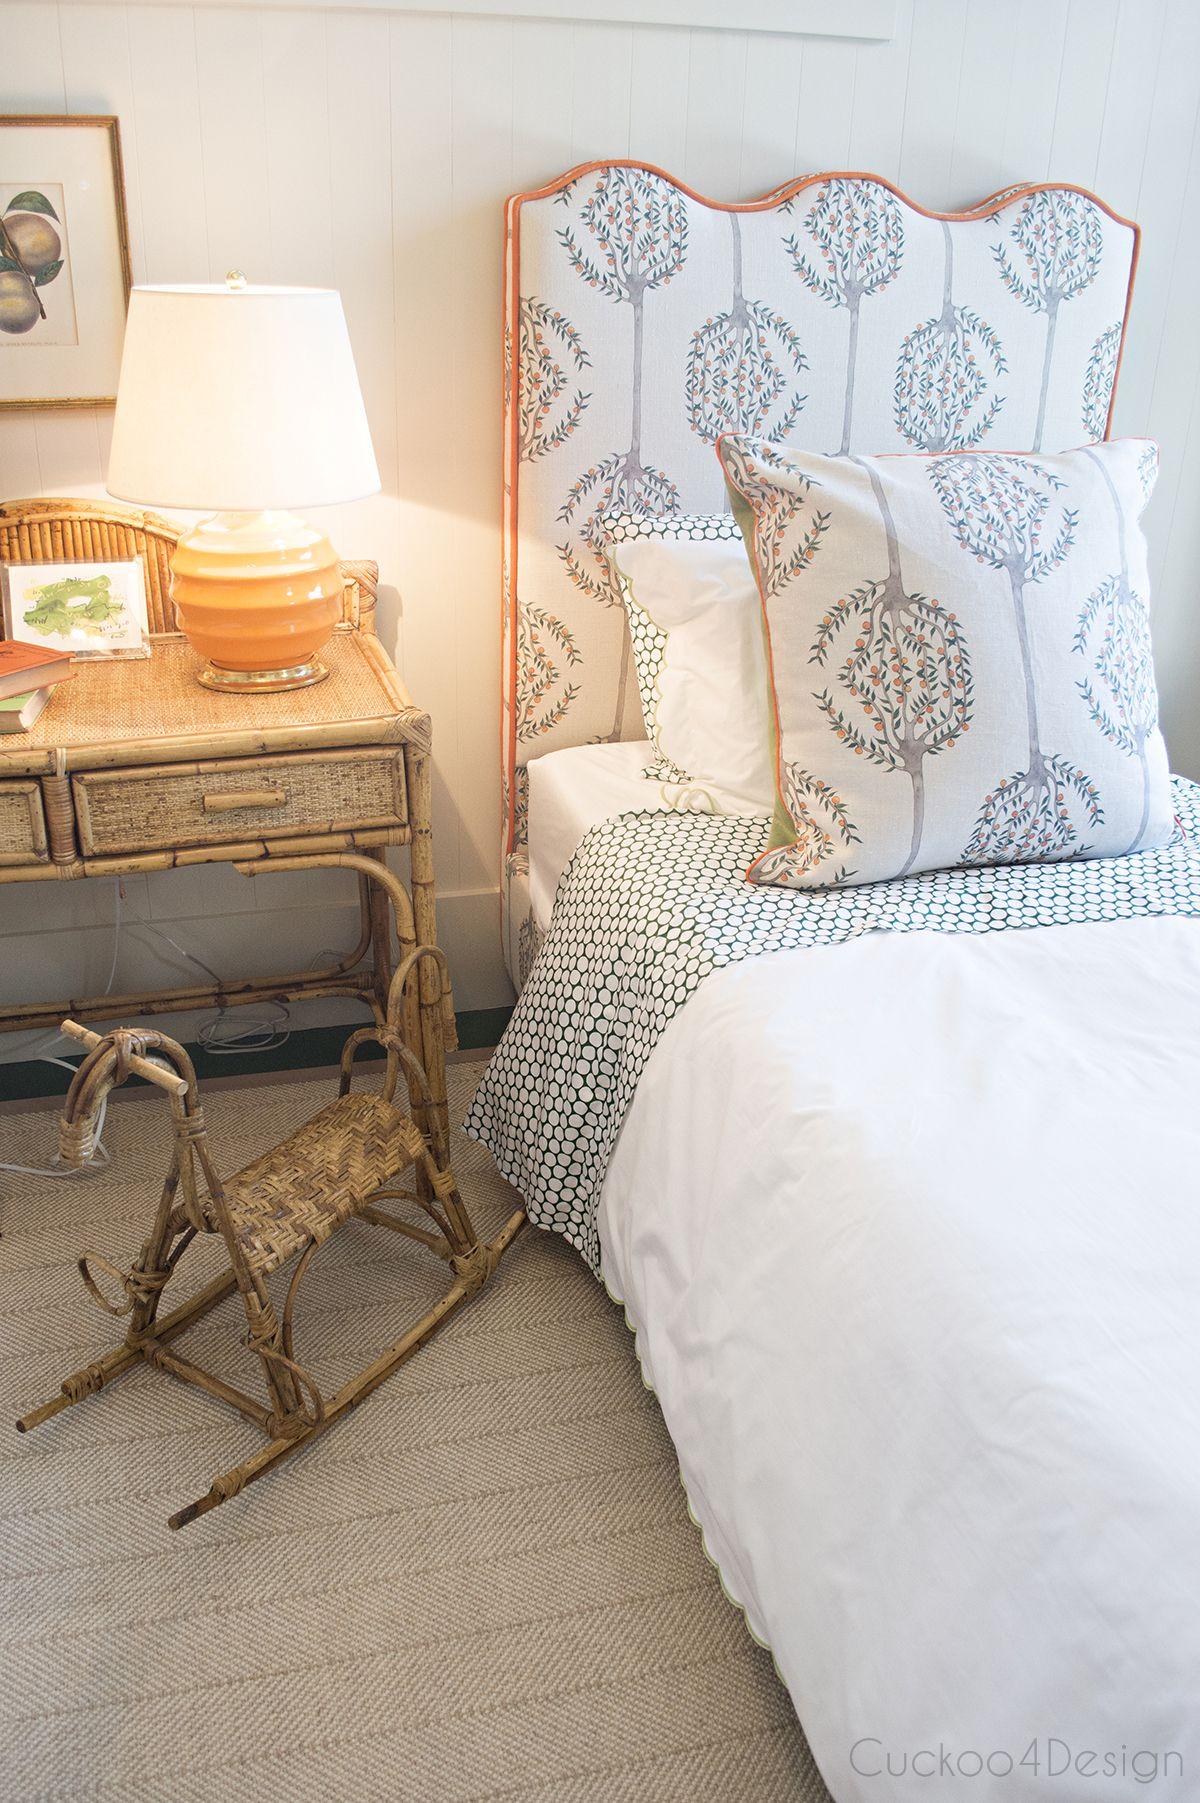 Kids bedroom with upholstered headboard orange trim and vintage wicker furniture